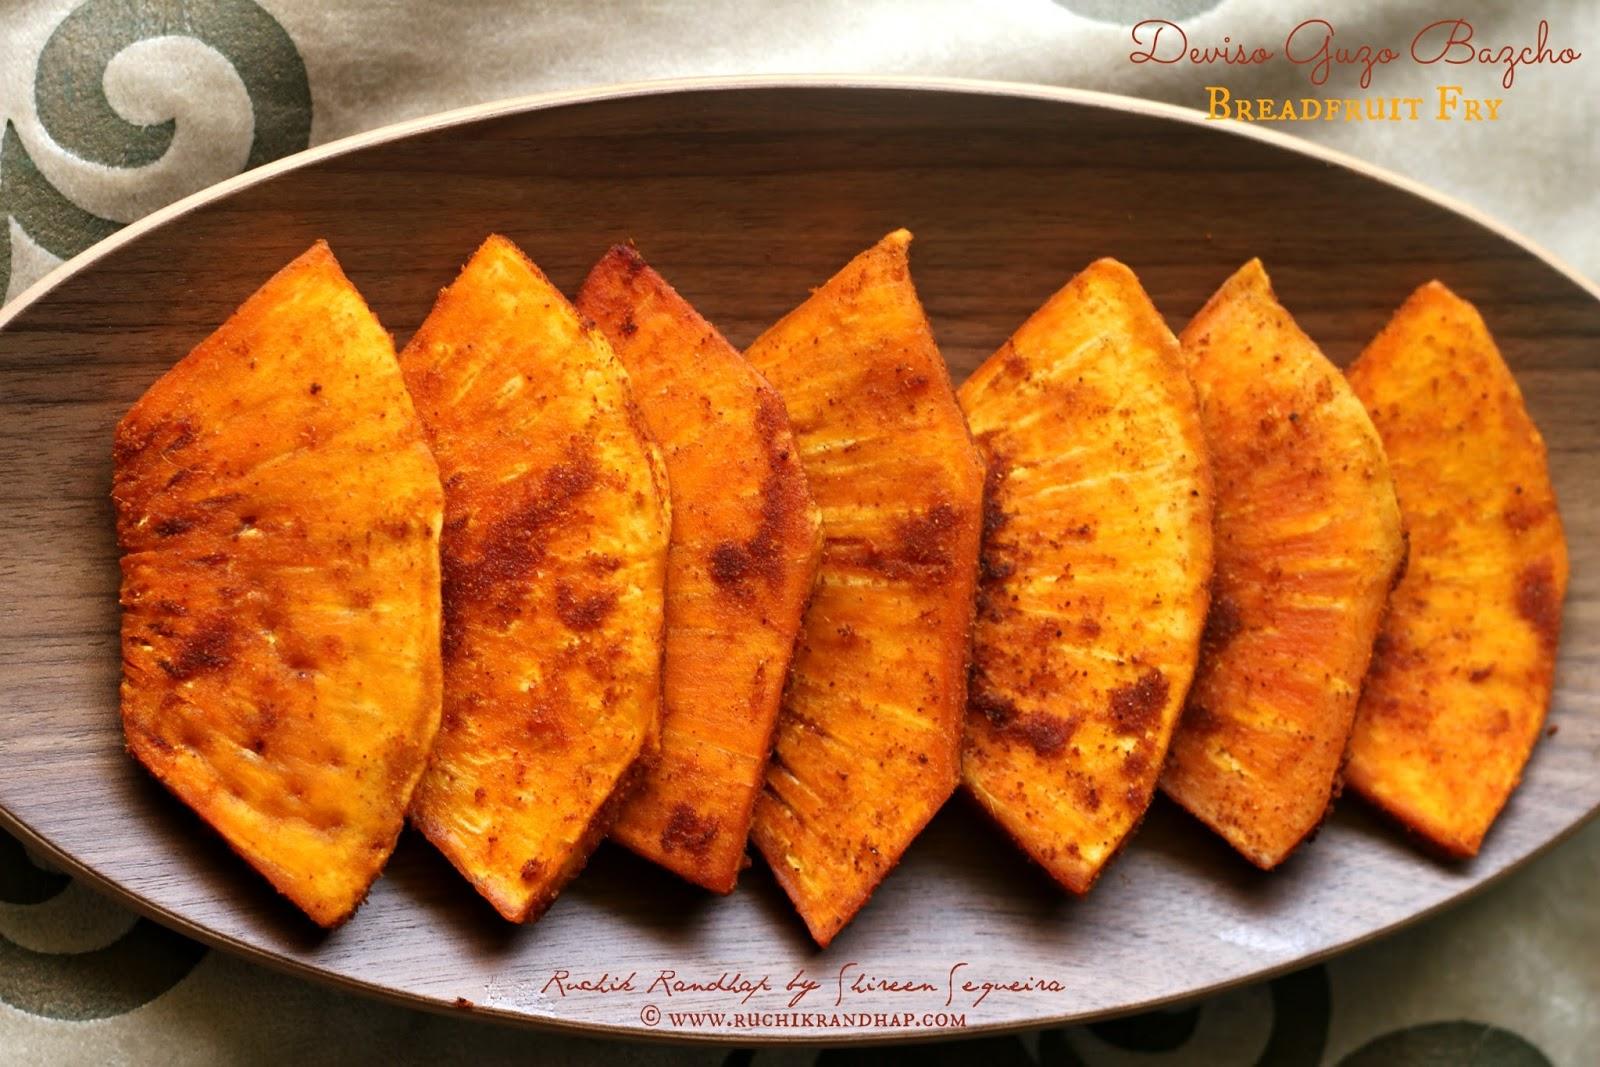 Deviso Guzo Bazcho ~ Breadfruit Fry - Ruchik Randhap